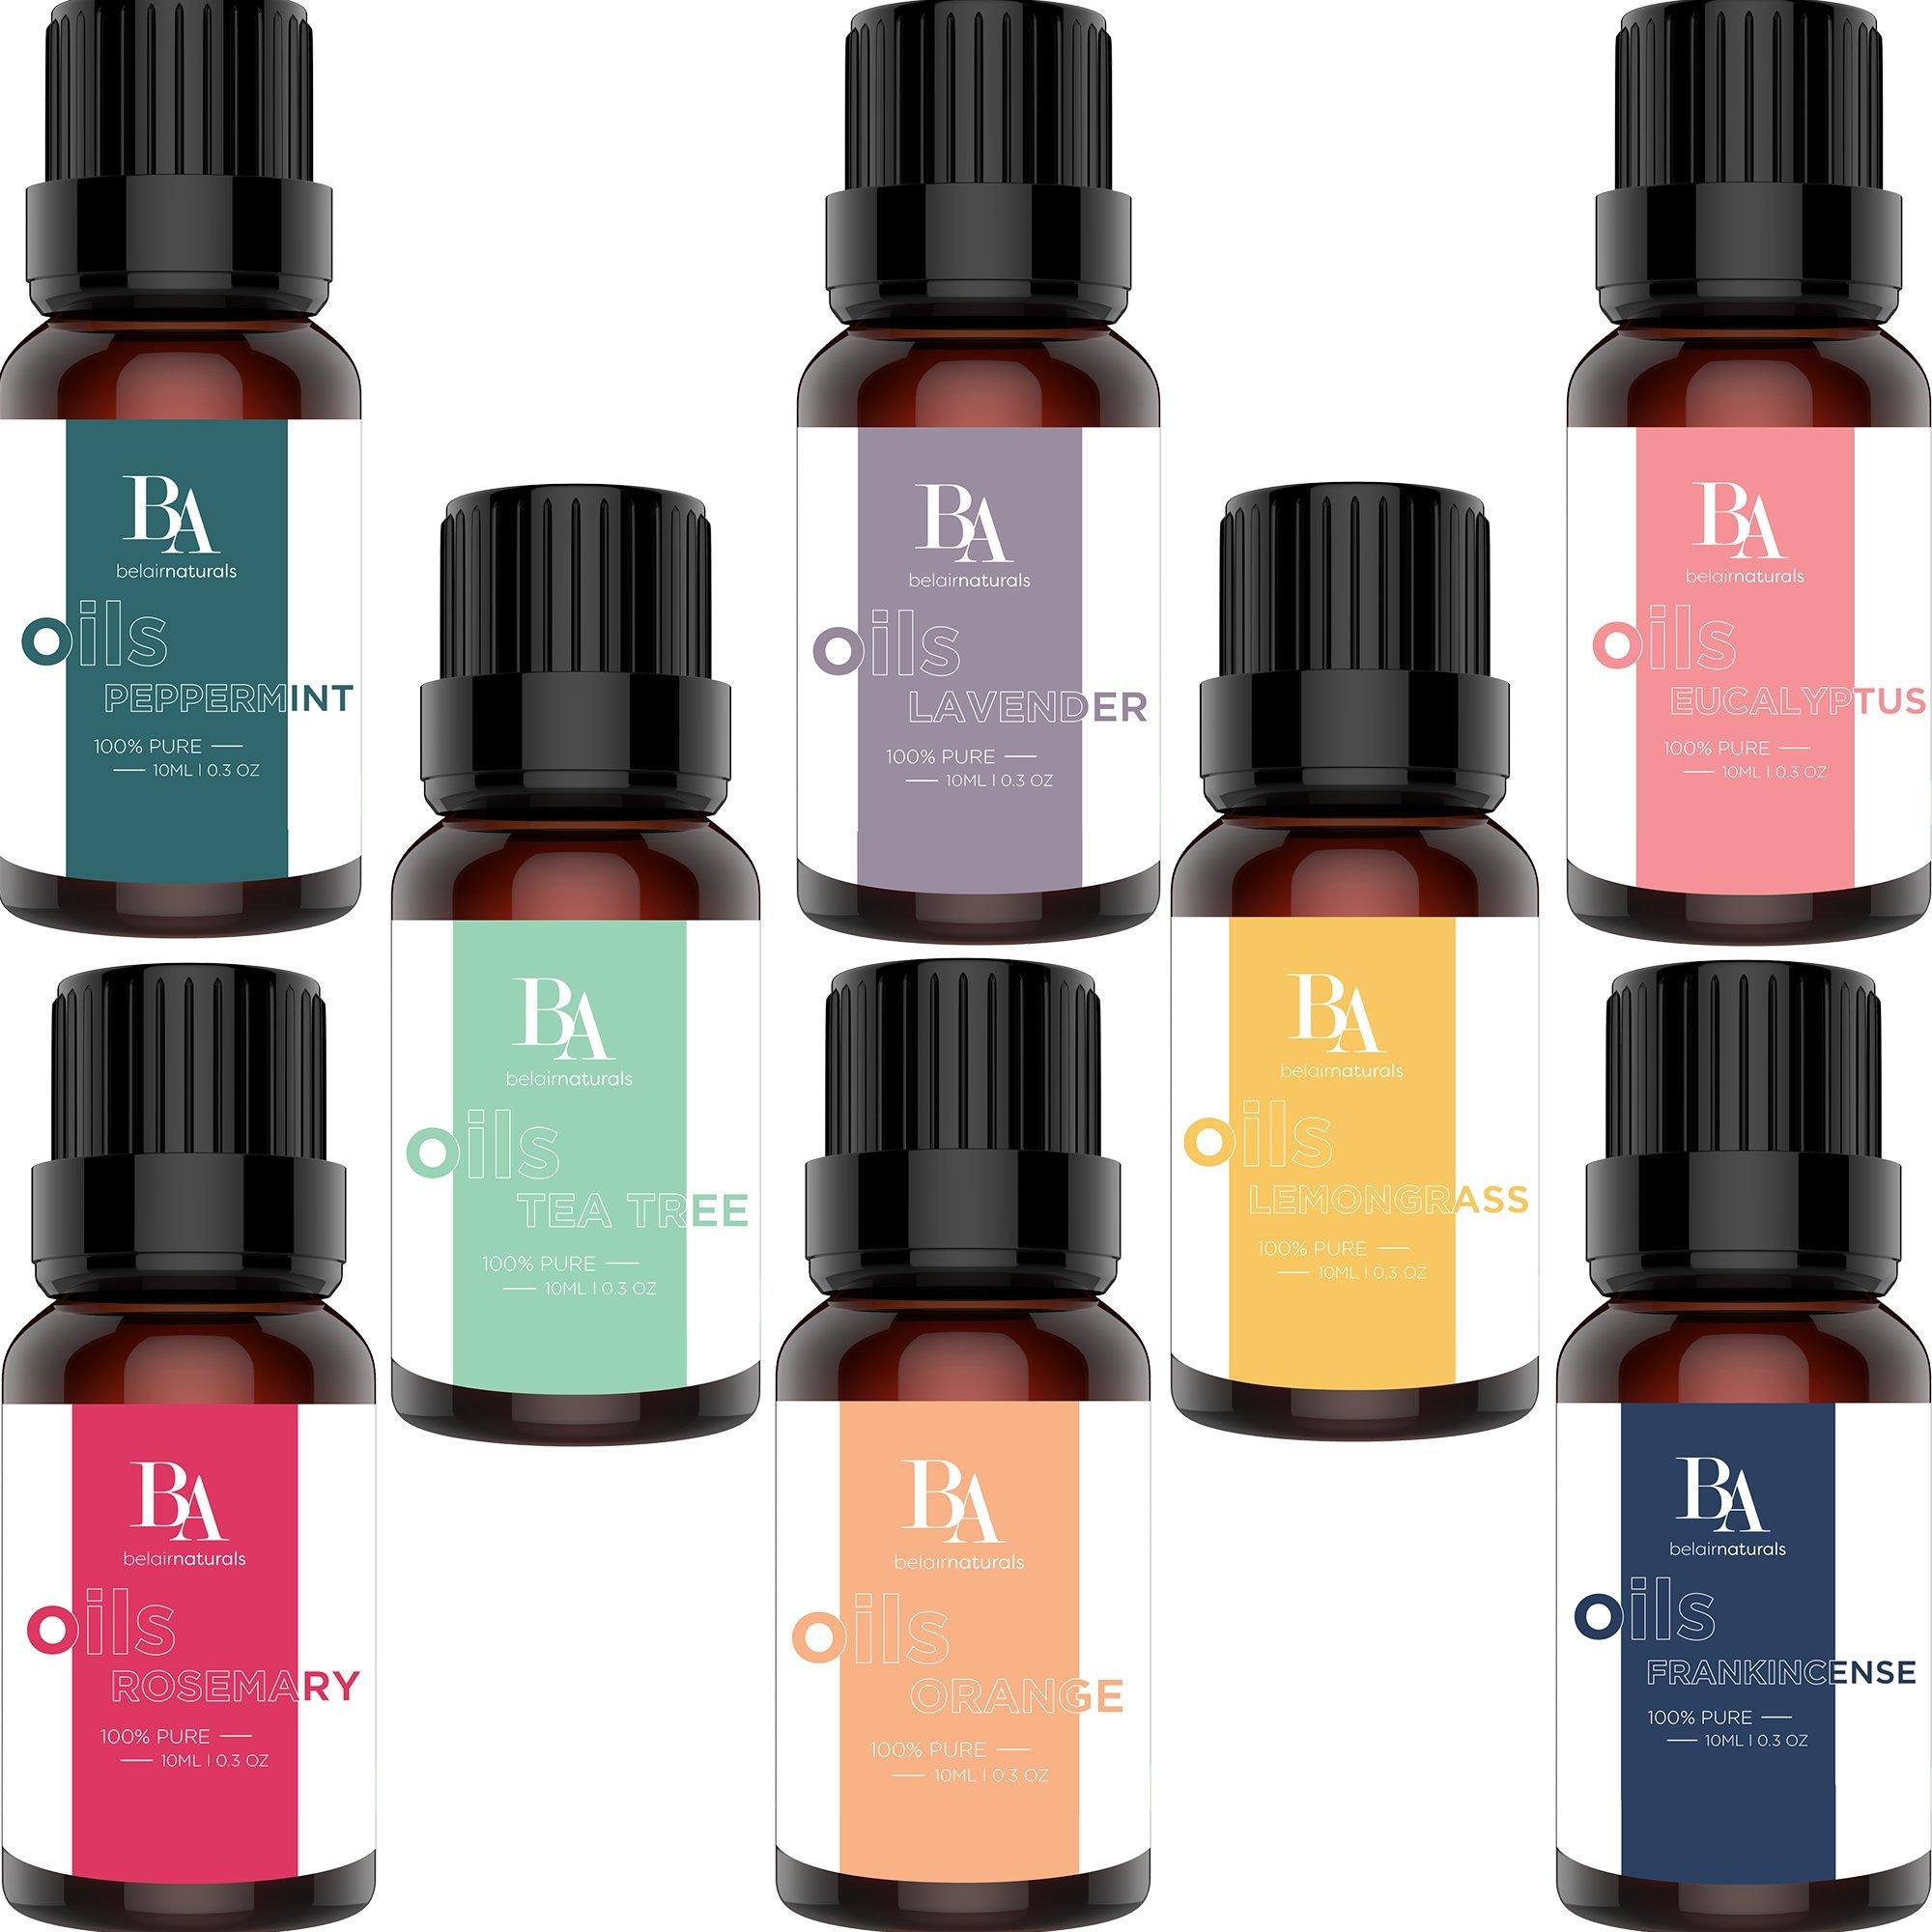 Bel Air Naturals Aromatherapy Essential Oils Set - 100% Pure Therapeutic Grade - Peppermint/Tea Tree/Rosemary/Orange/Lemongrass/Lavender/Eucalyptus/Frankincense - Best For Oil Diffuser, Massage, Focus